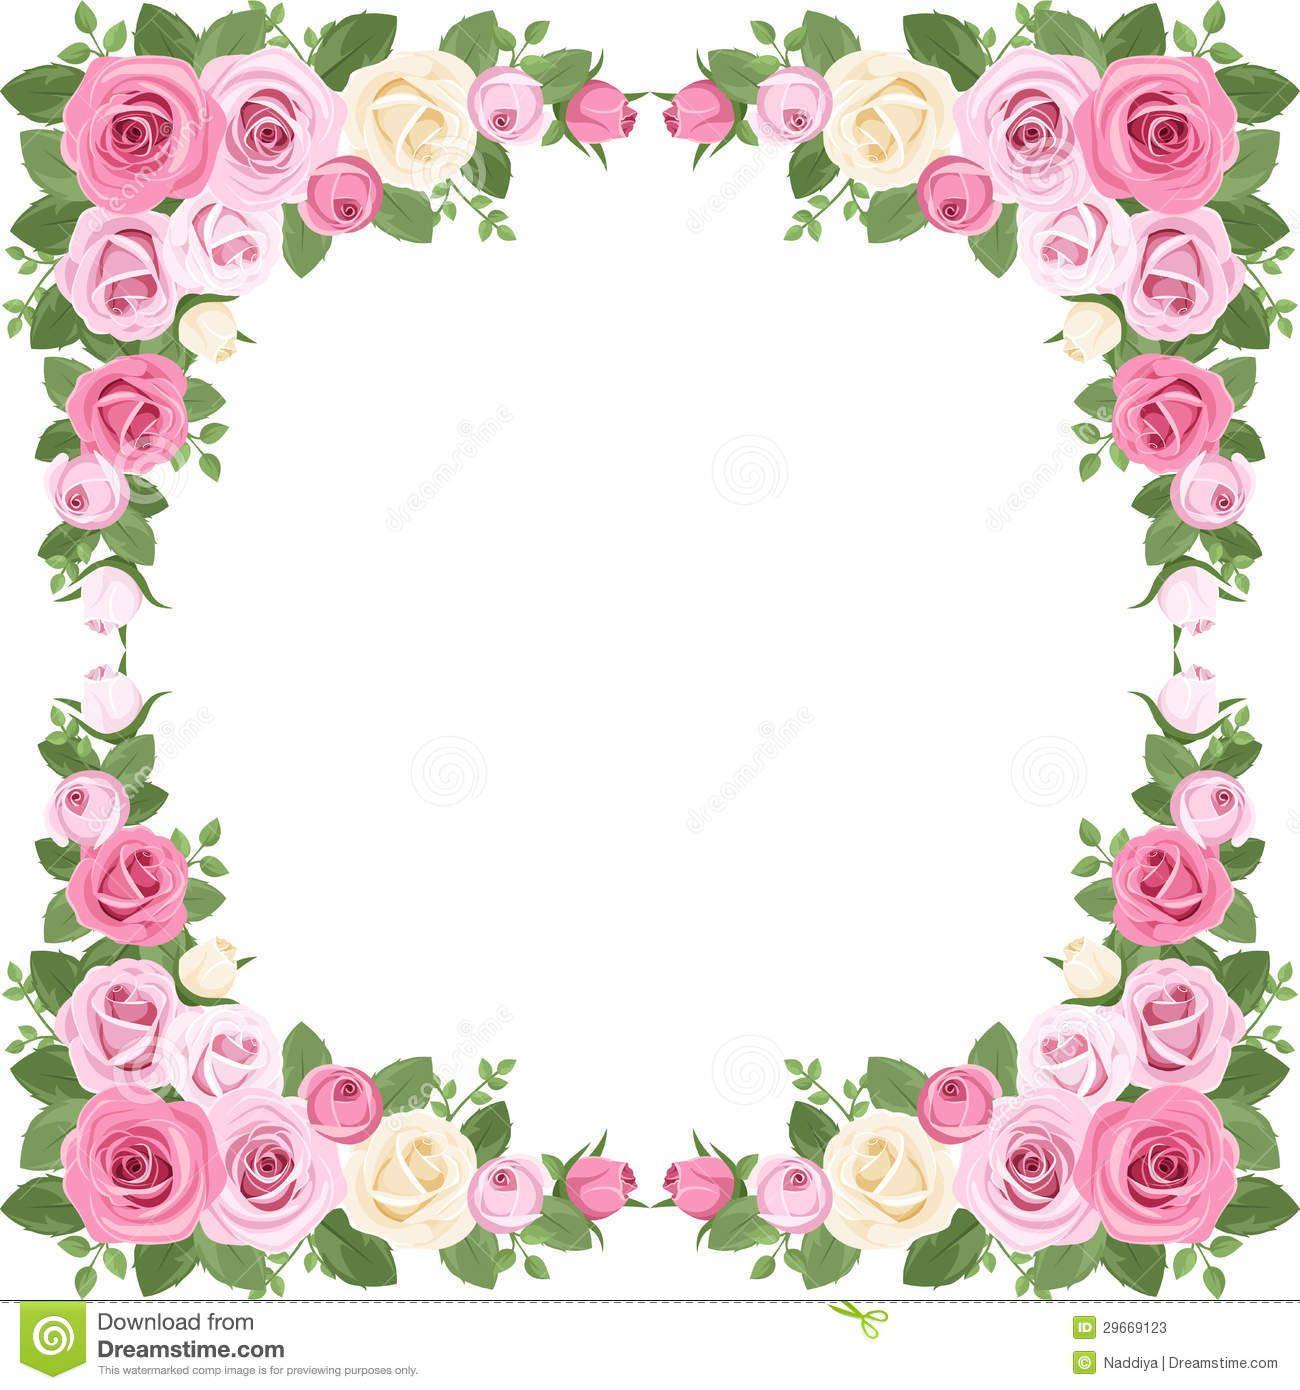 Vintage Roses Frame Vector Illustration Stock Vector Illustration Of English Element 29669123 Rose Frame Cherry Blossom Wall Art Pink Background Images